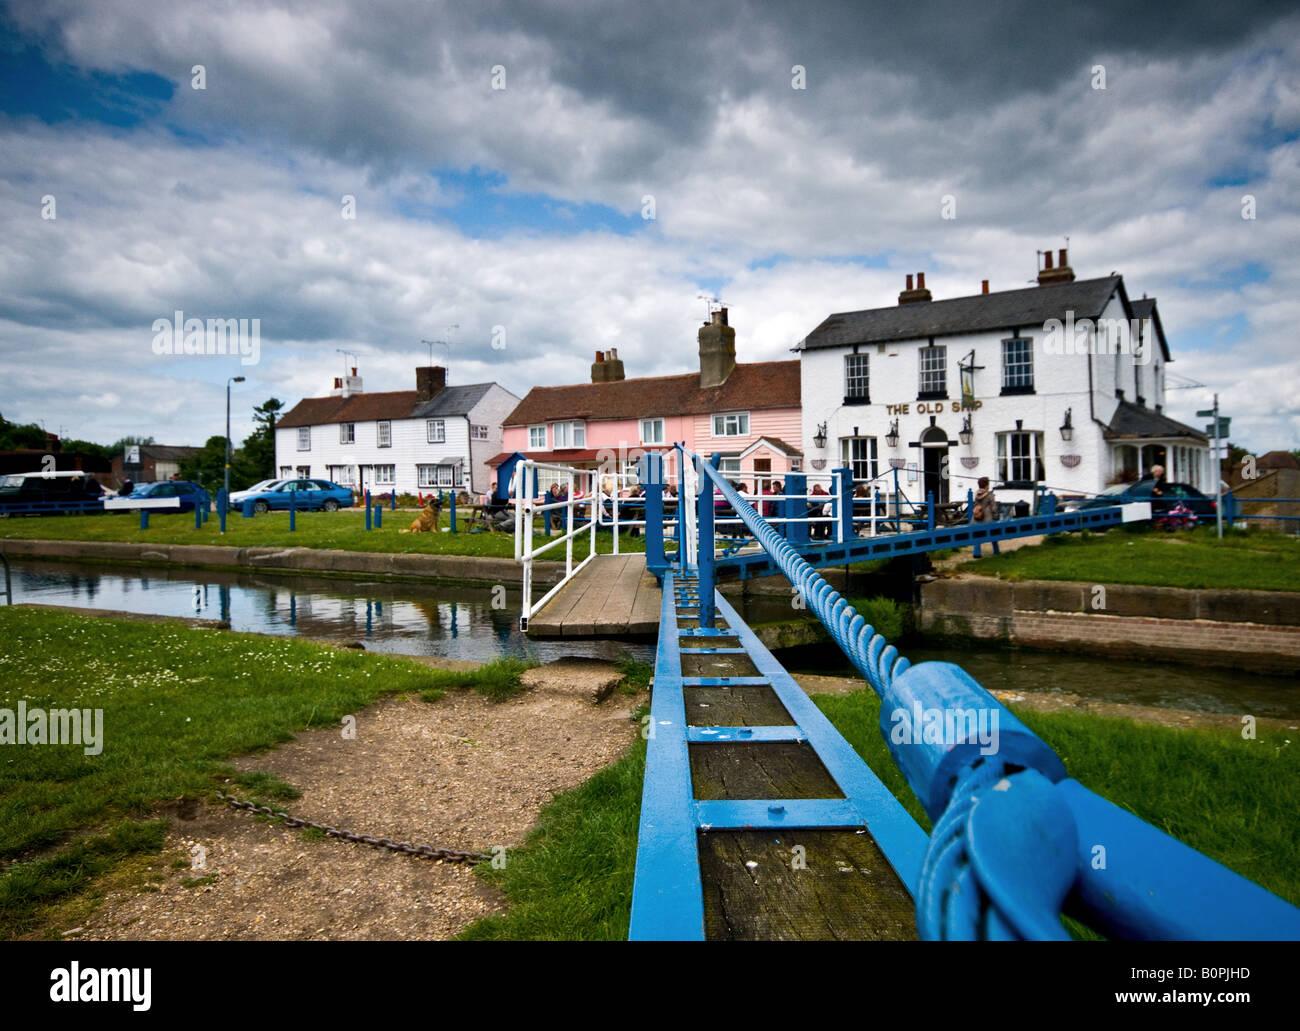 =The lock gates near the Old Ship Inn at Heybridge Basin in Essex. - Stock Image